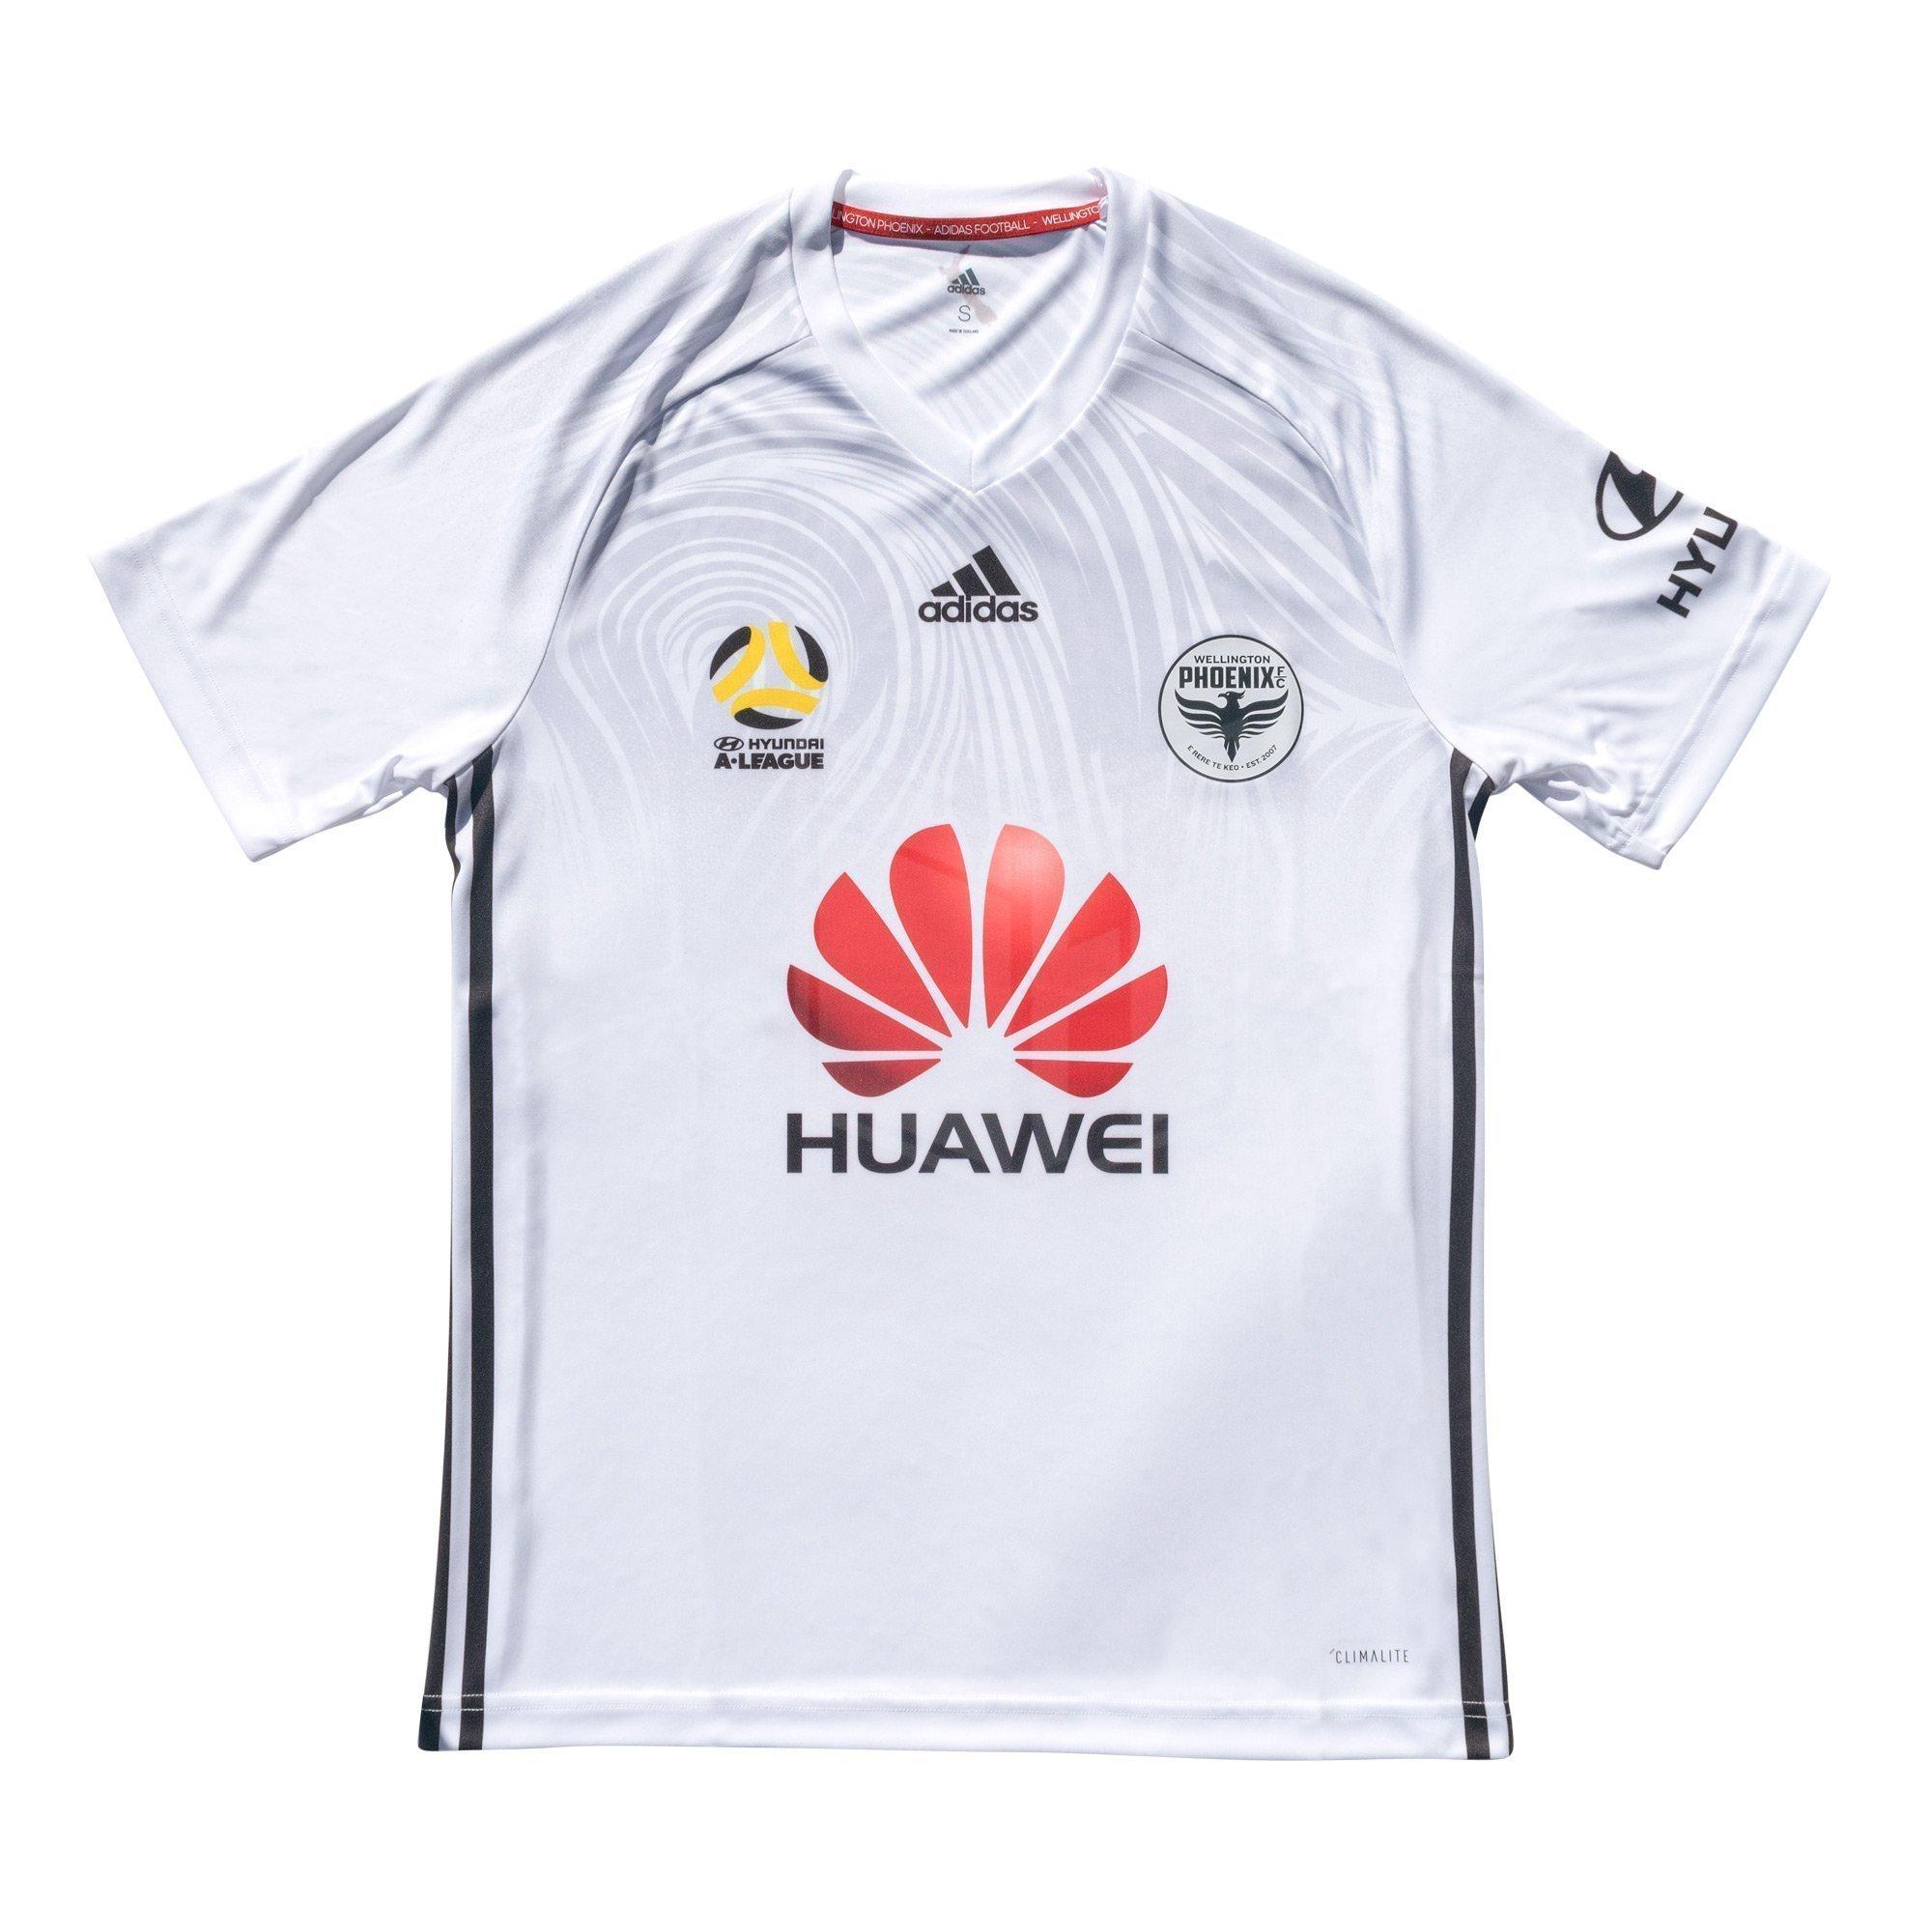 ... Wellington Phoenix 17 18 Adidas Home Kit · Click to enlarge image  wellington phoenix 17 18 adidas away kit a.jpg ... 618038124